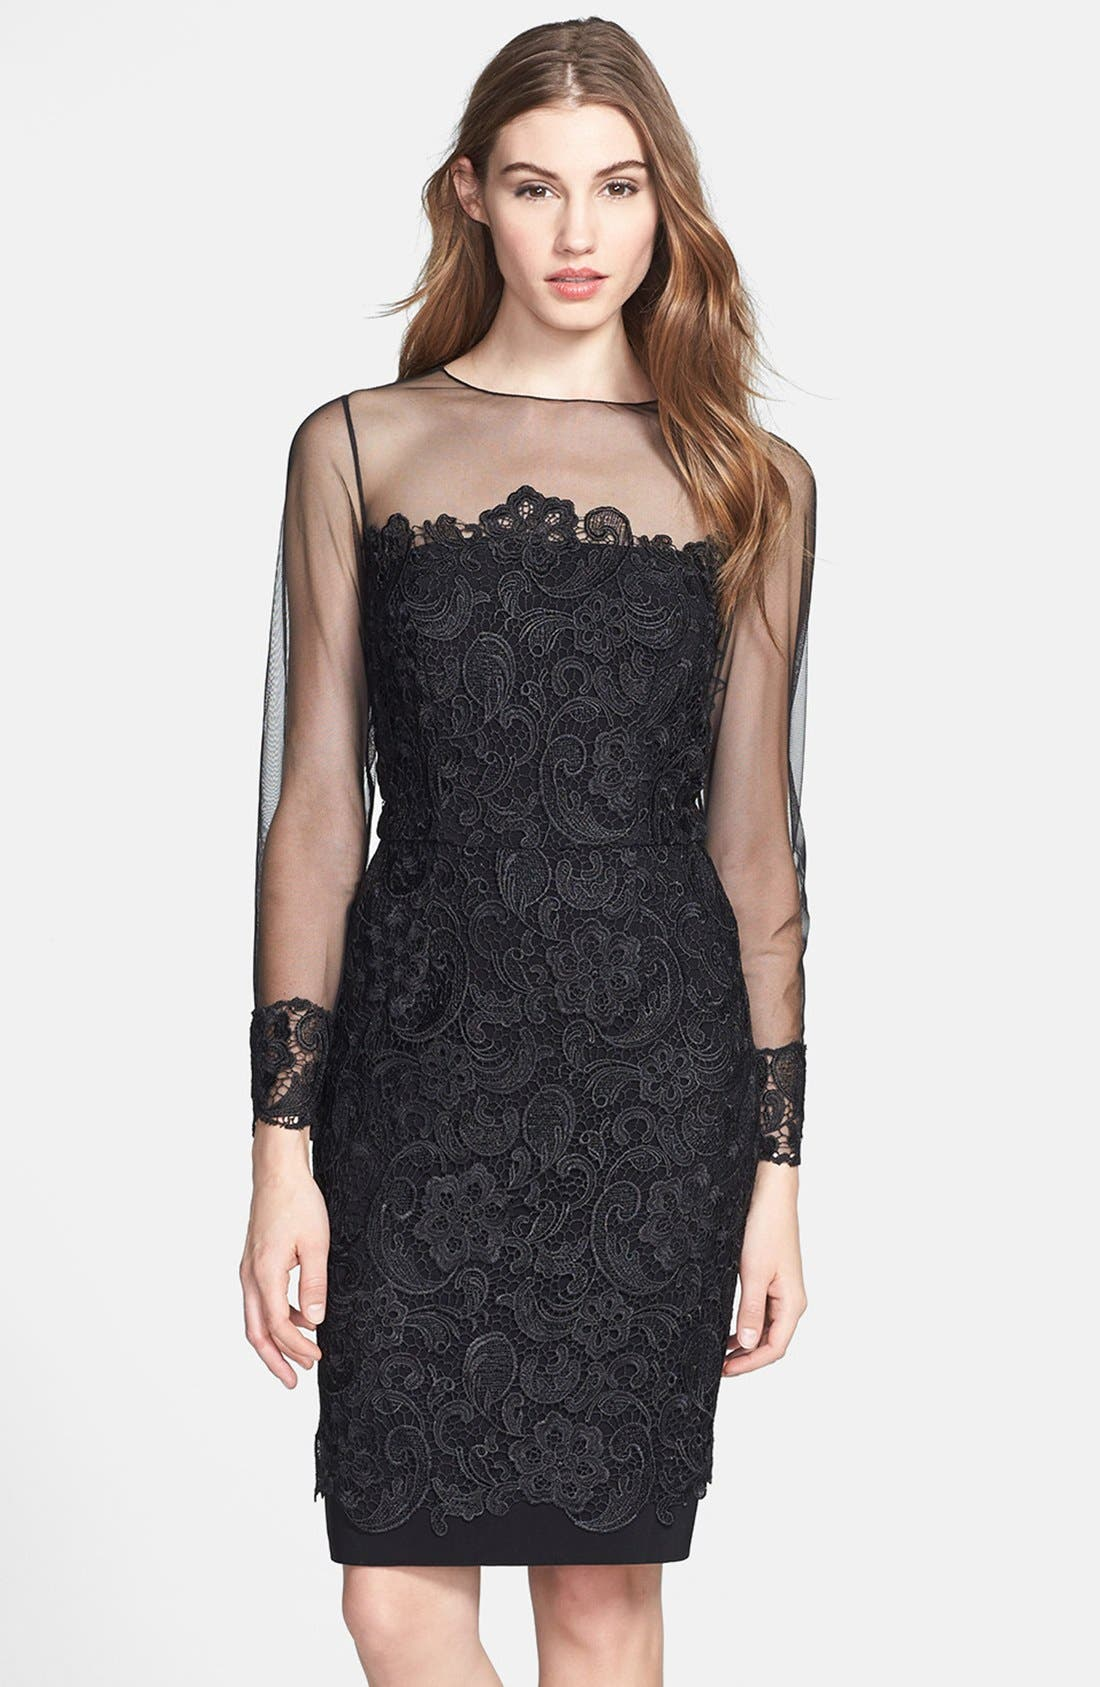 Alternate Image 1 Selected - Patra Illusion Yoke Lace Sheath Dress